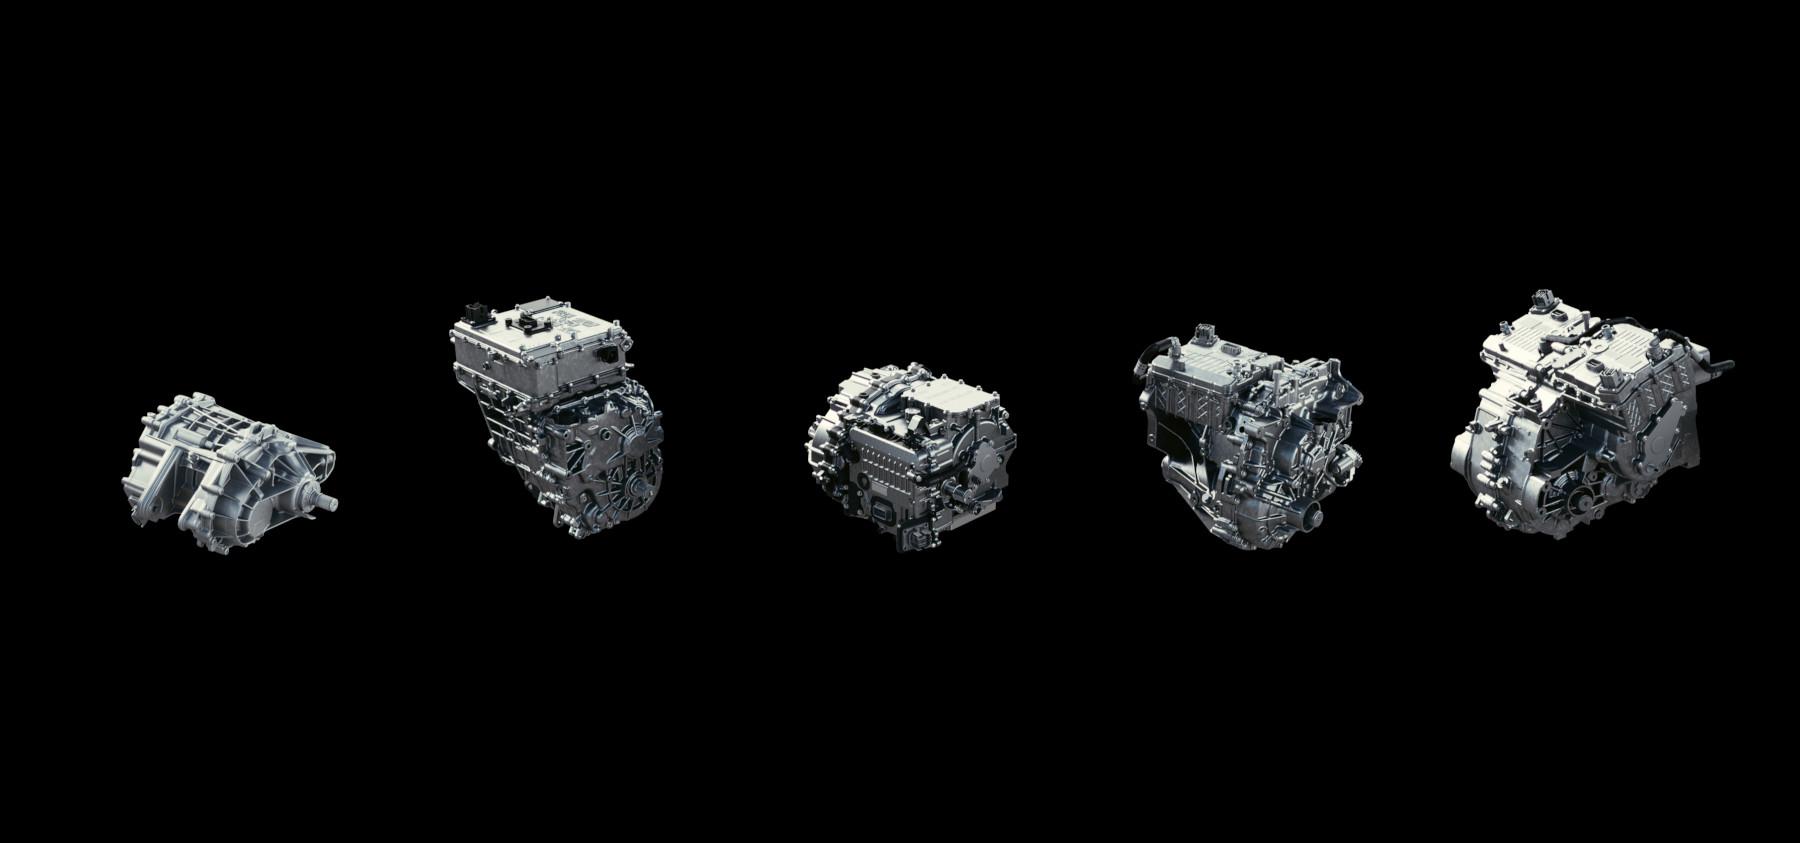 Ultium Drive, el sistema clave en el futuro de General Motors